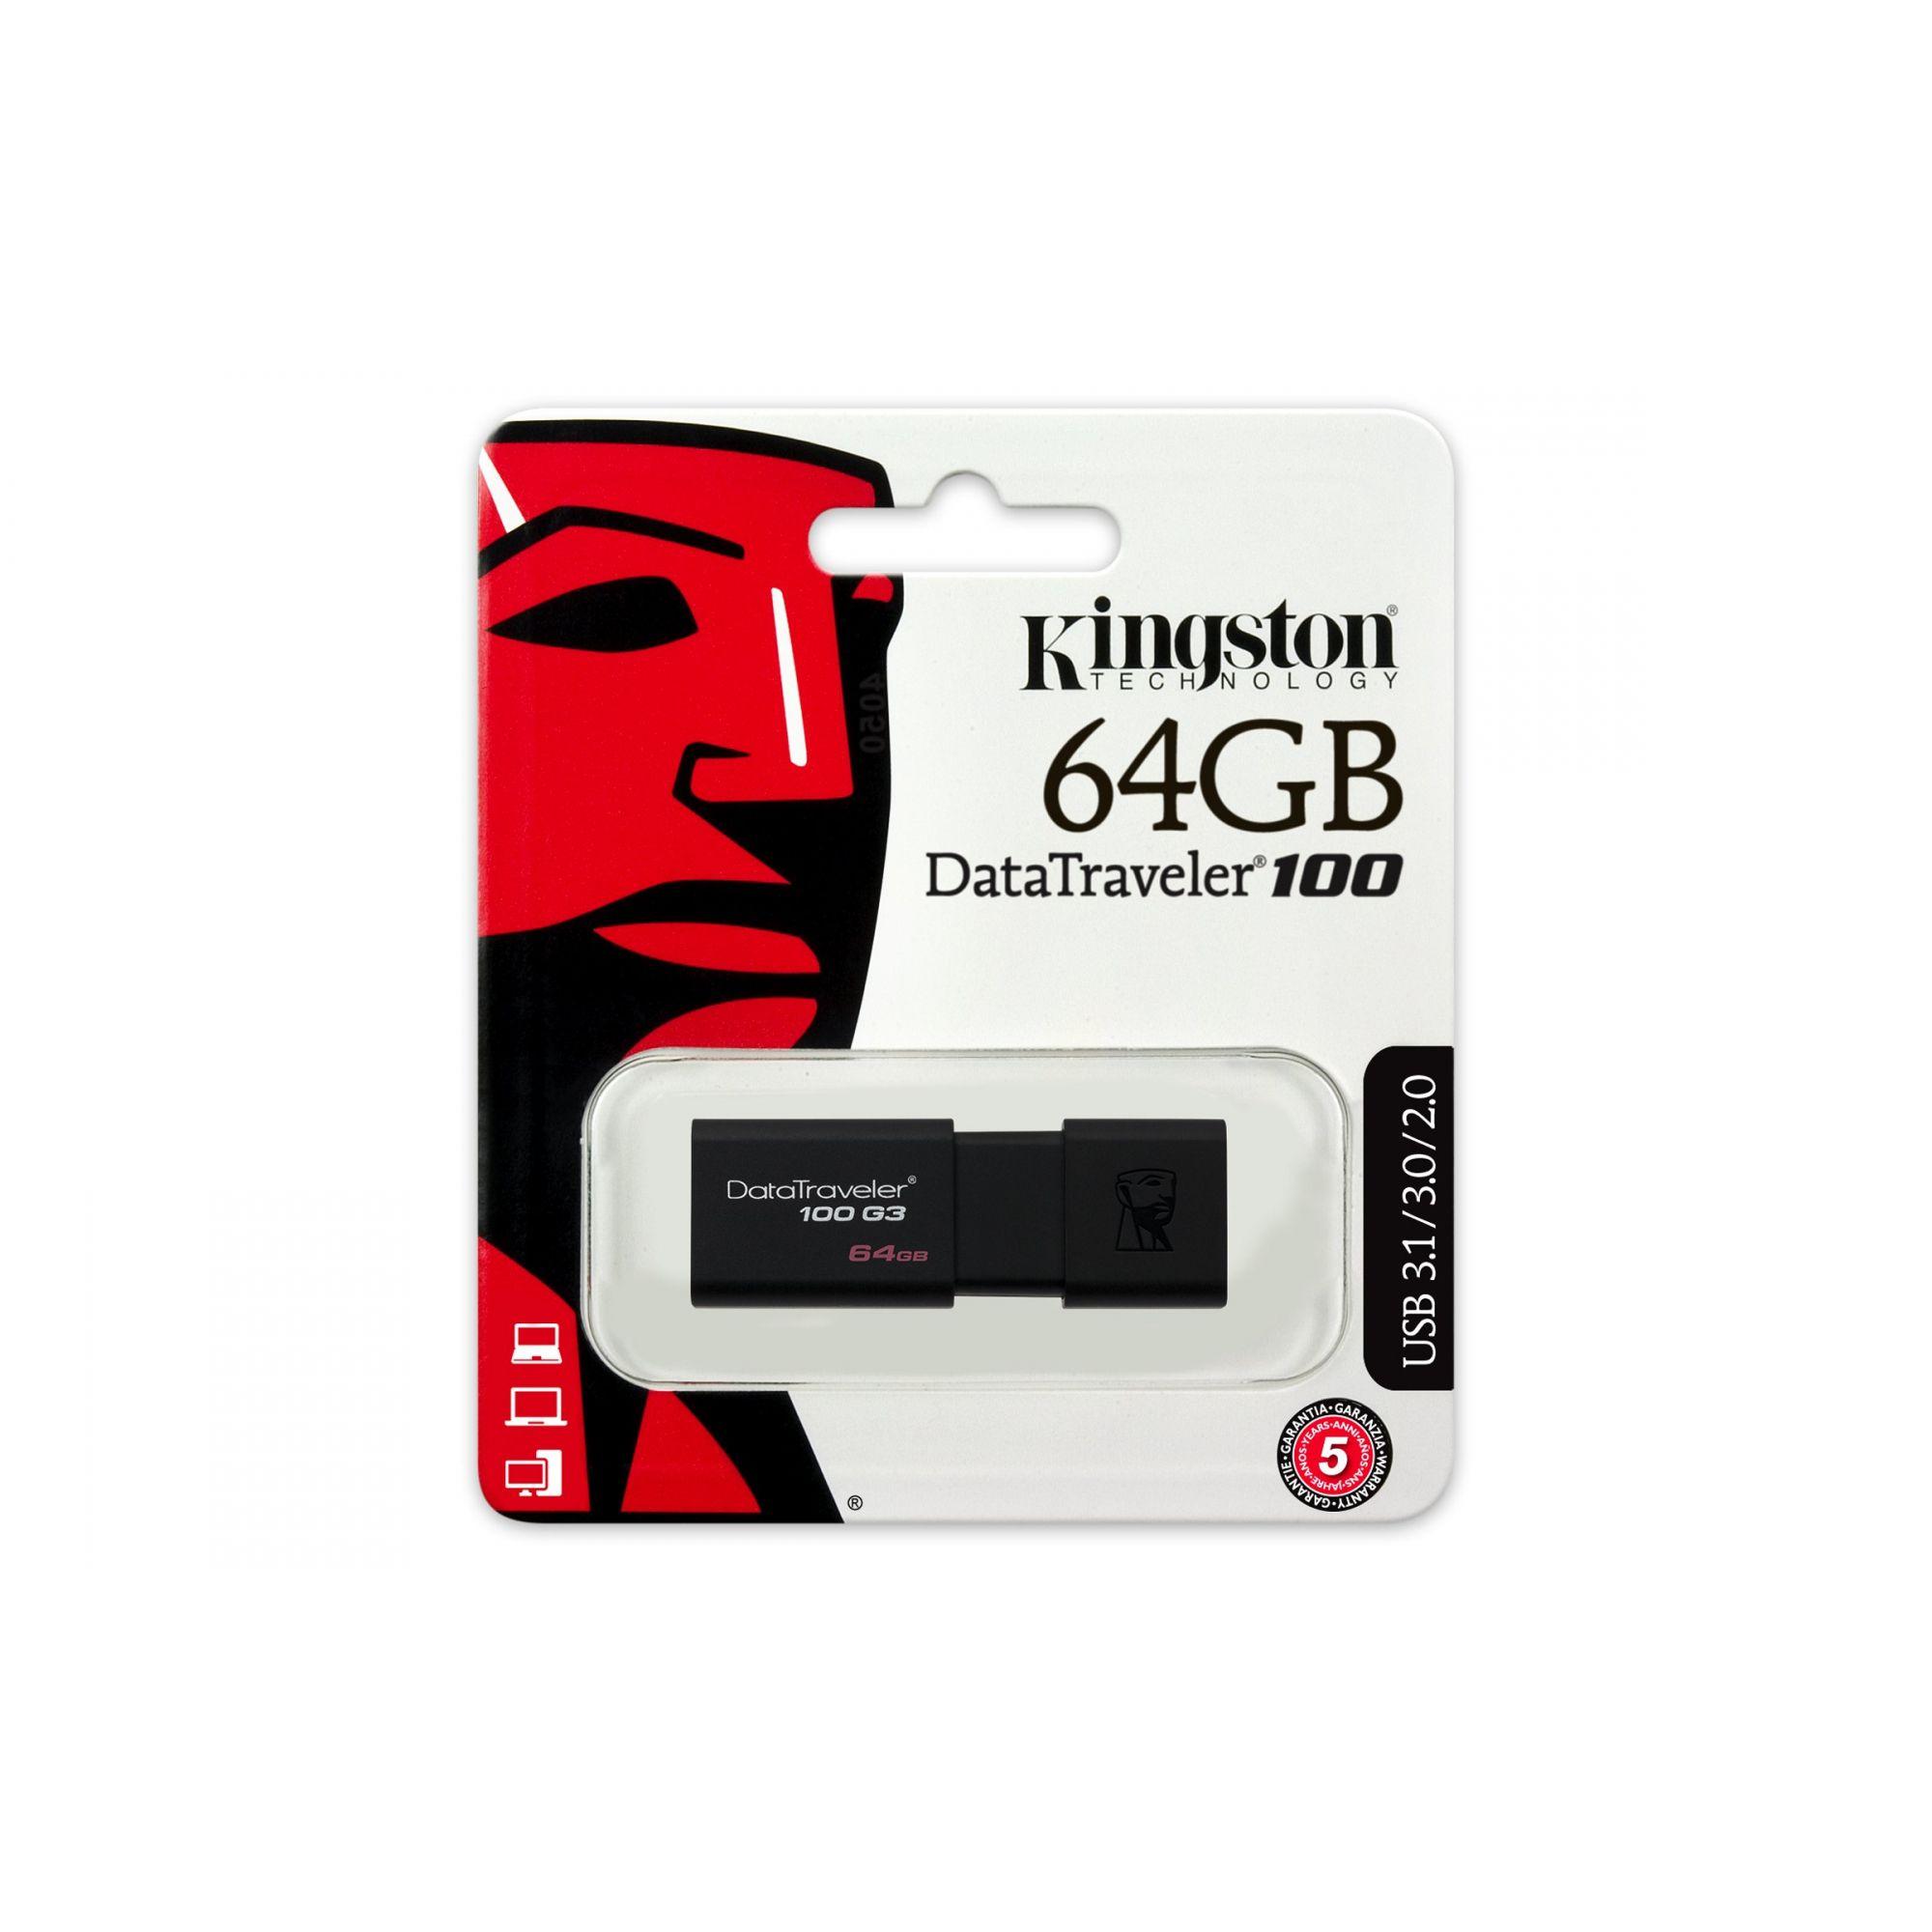 PEN DRIVE USB 3.0 DT100G3/64GB DATATRAVELER 100 64GB GENERATION 3 KINGSTON